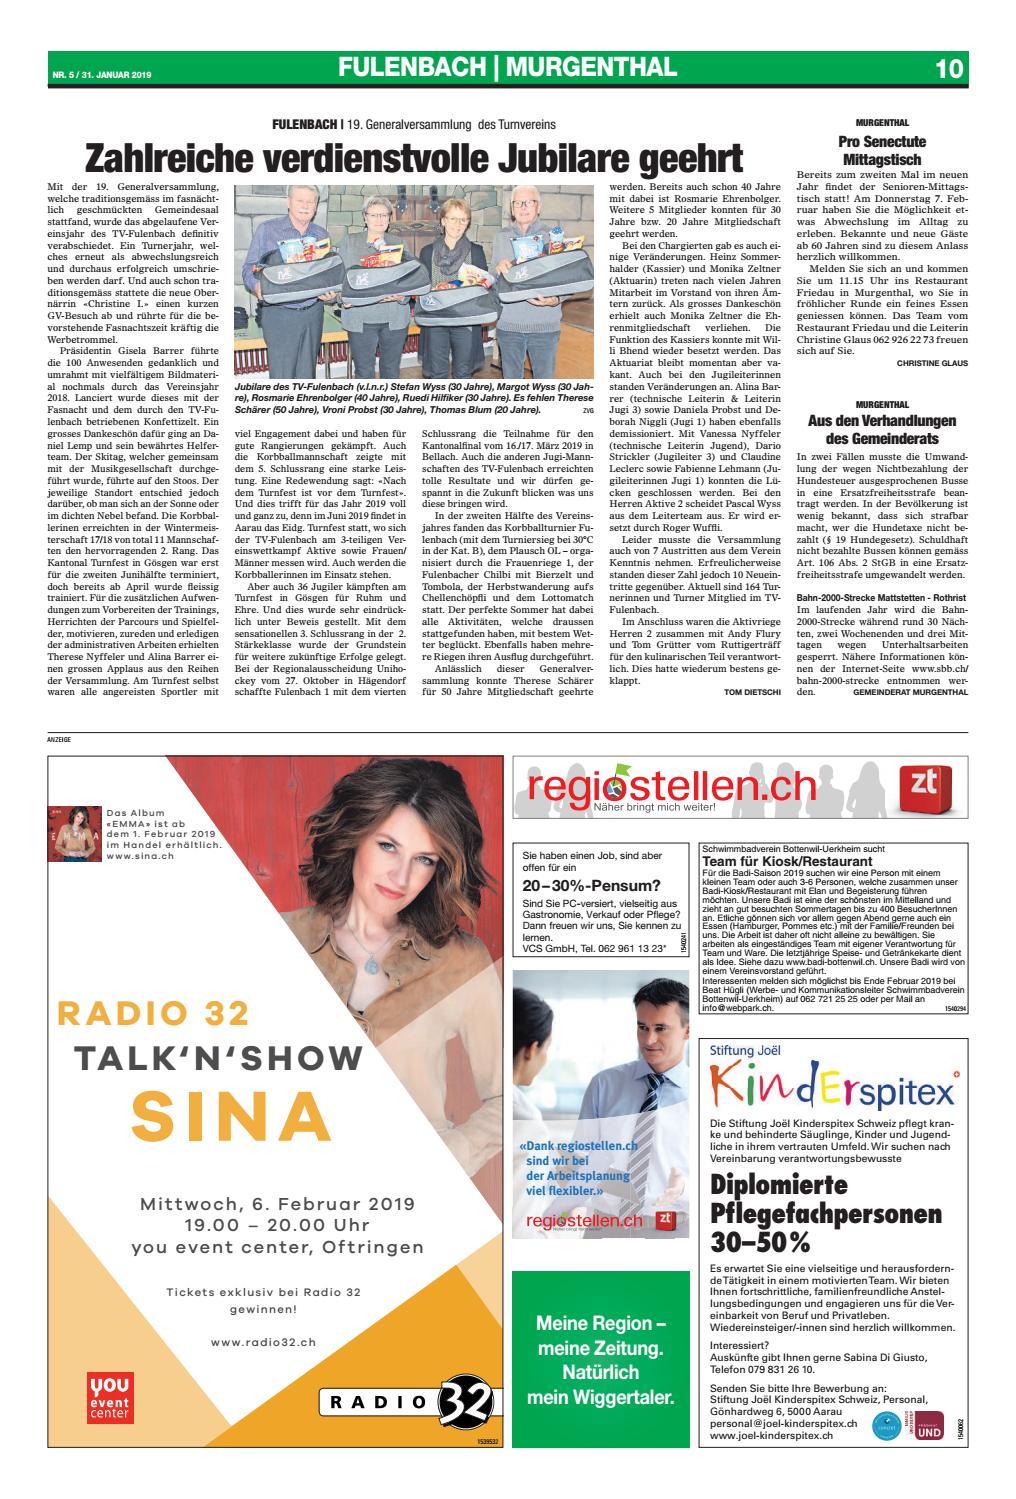 Wiggertaler 05/19 by ZT Medien AG - issuu